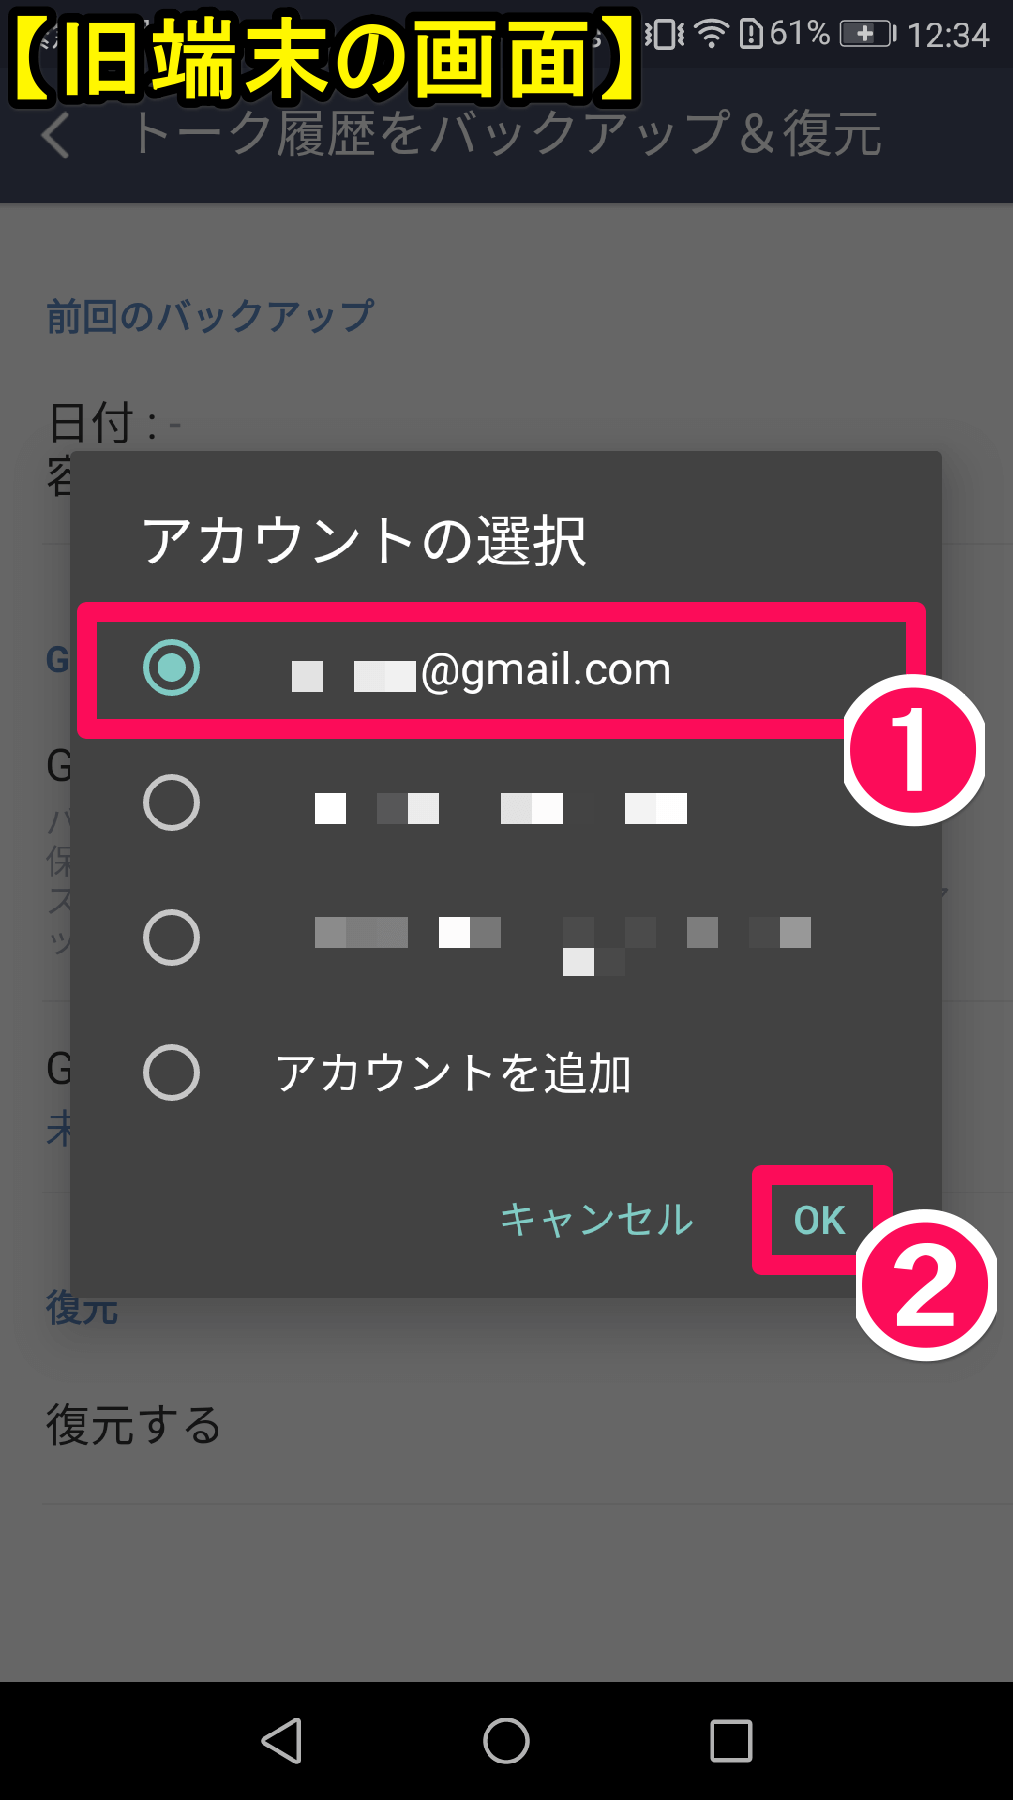 LINE(ライン)の移行元(旧端末)の[アカウントの選択]画面